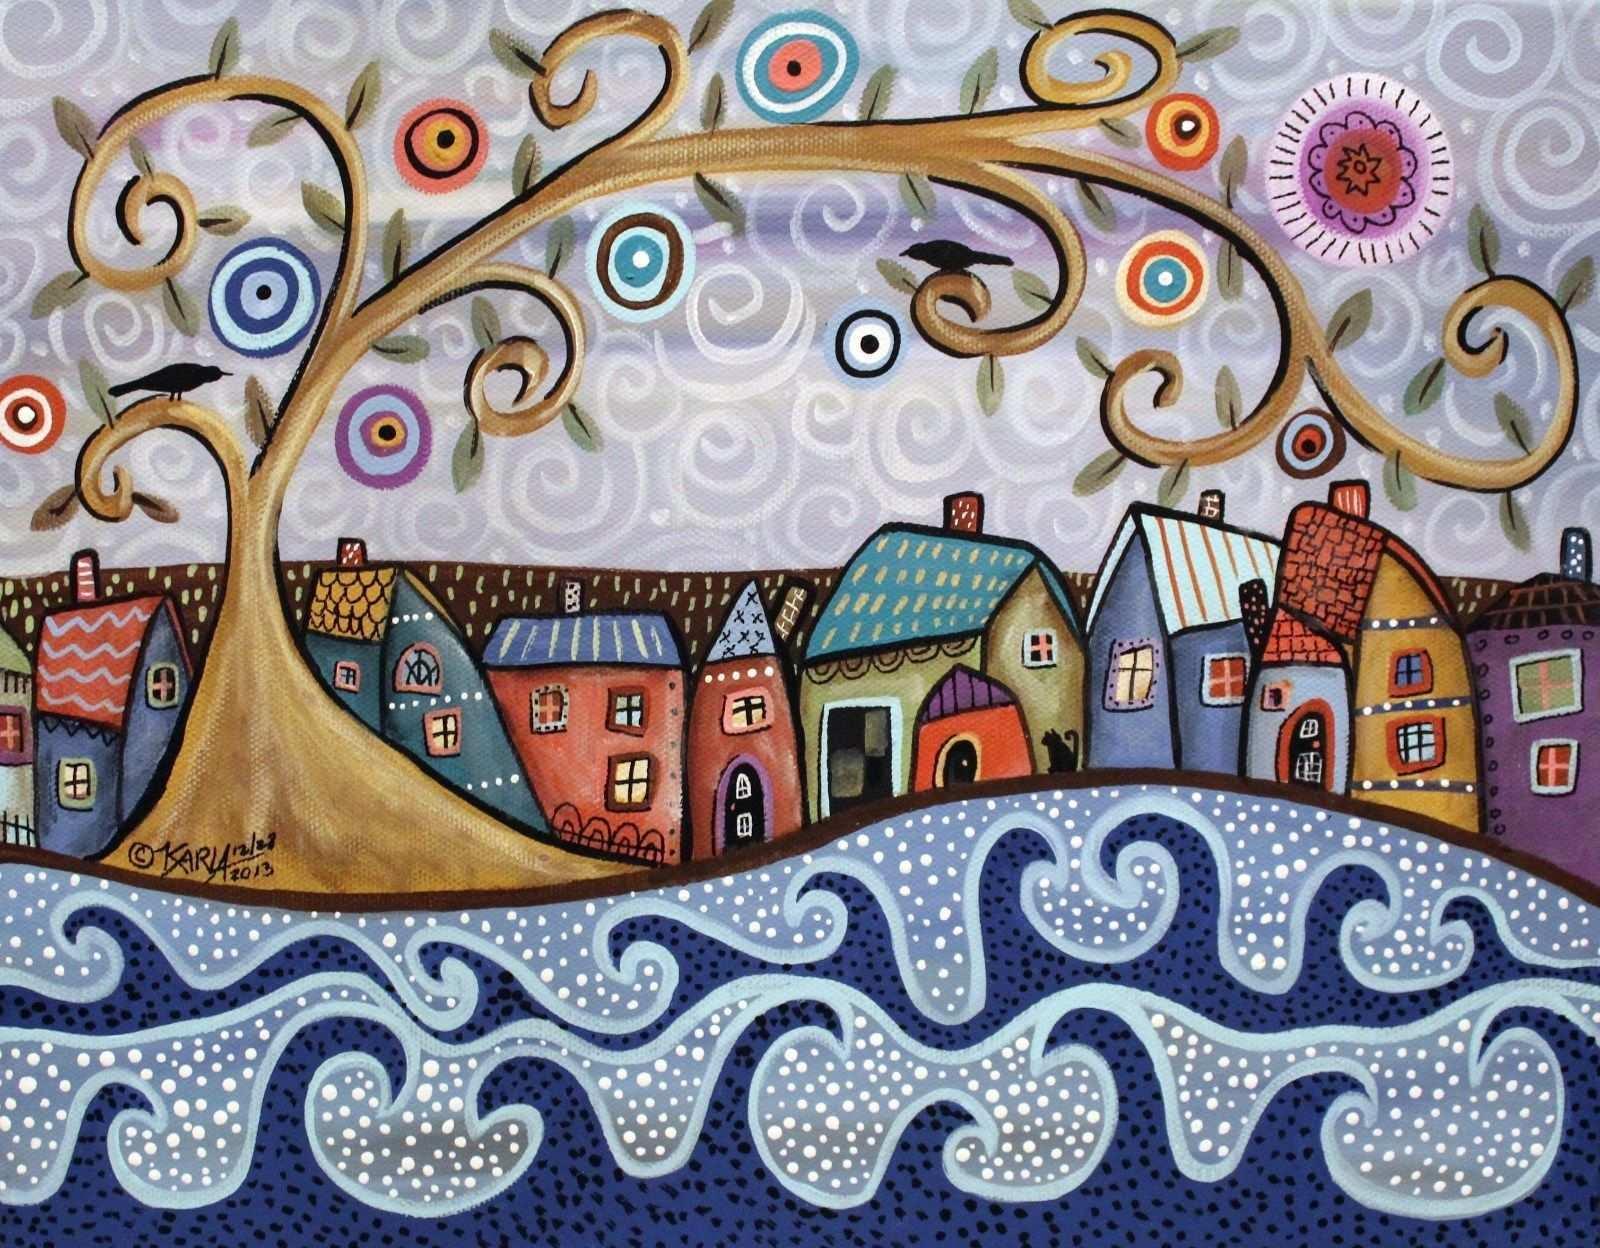 Rug Hook Paper Pattern By The Sea Folk Art Abstract Primitive Karla Gerard Volkstumliche Kunstgemalde Kunstproduktion Kunstmalerei